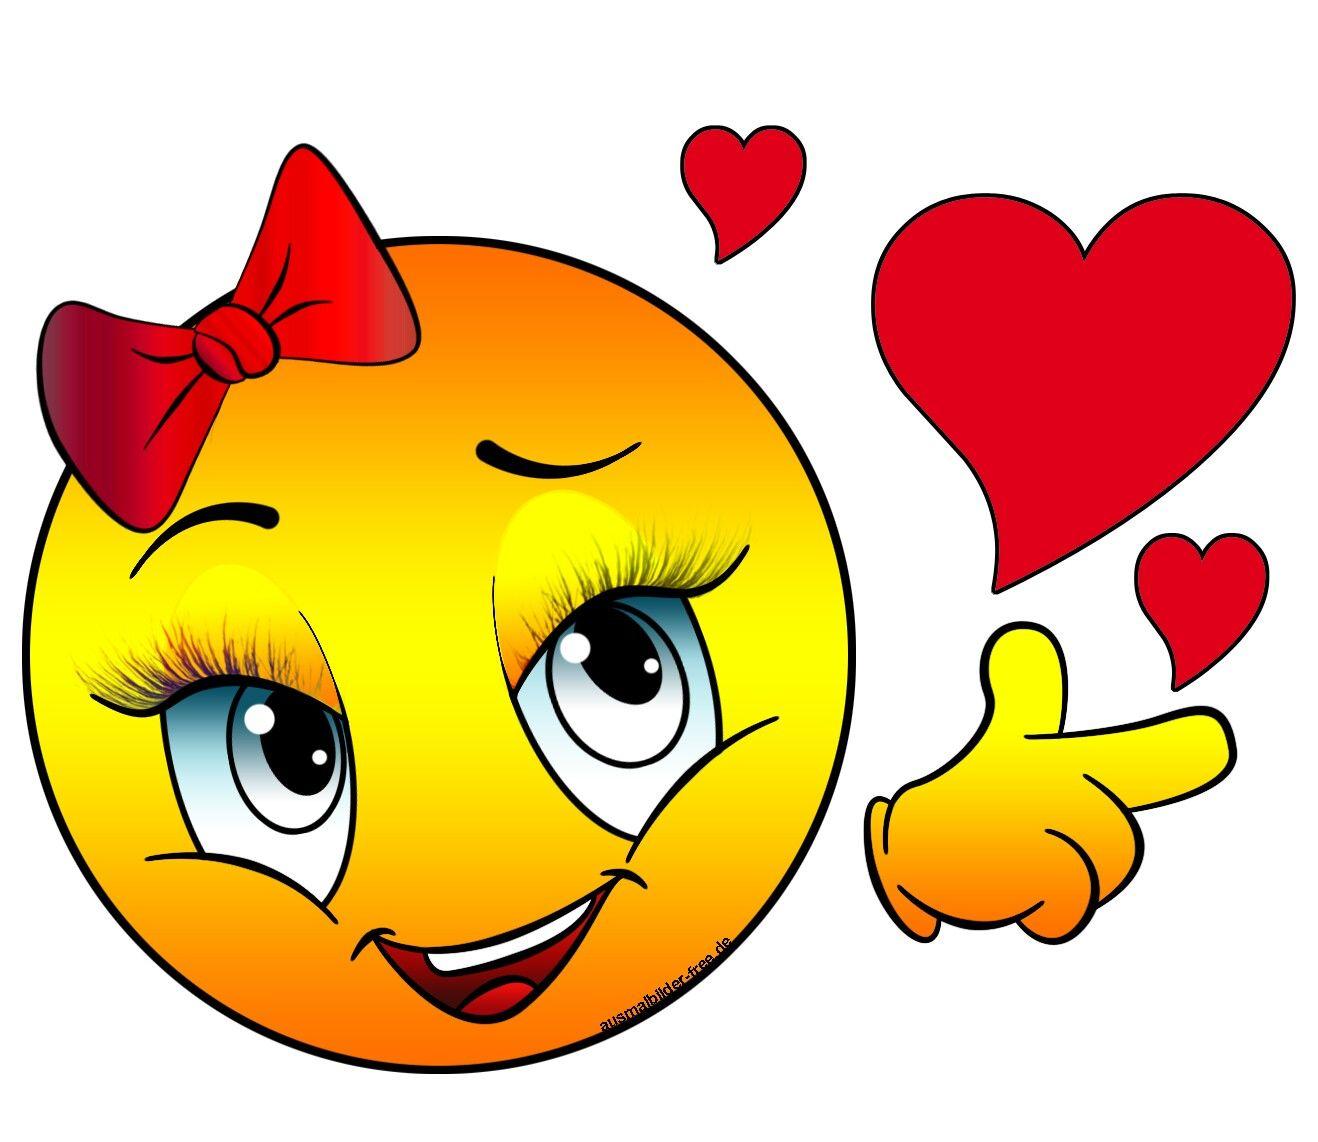 Feliz Dia Caras Felices Dibujos Faciles De Amor Caritas De